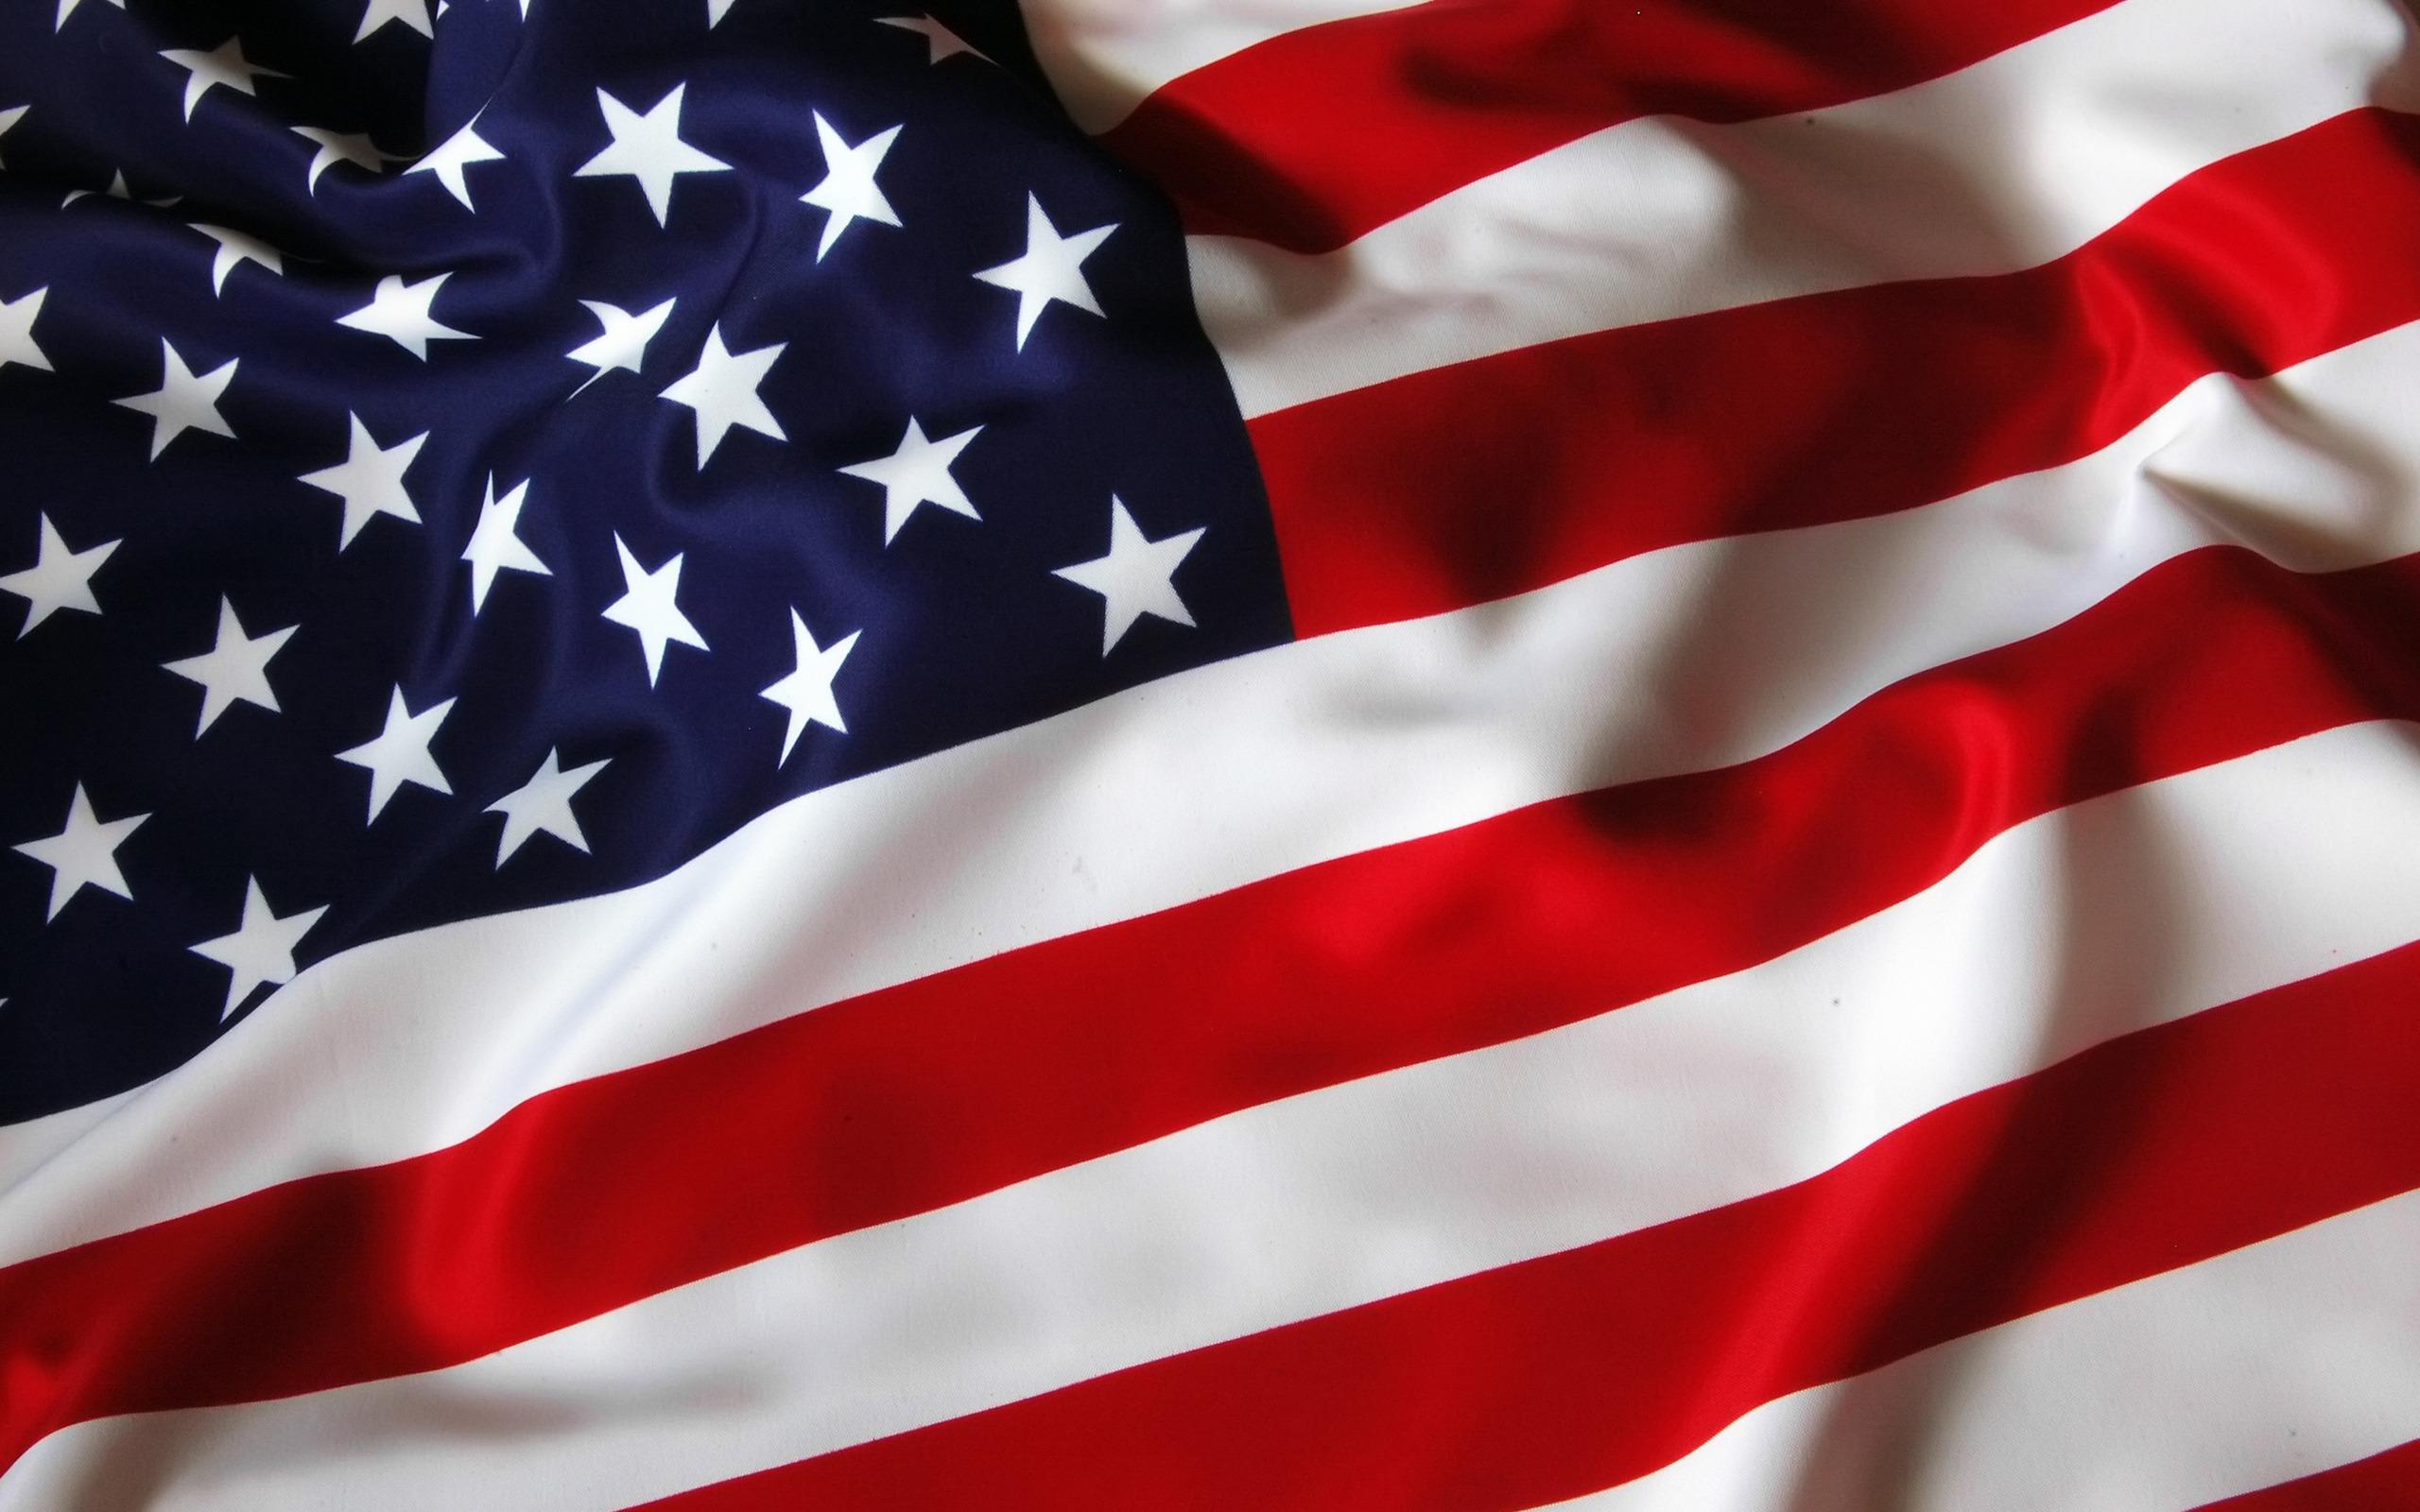 States Flag Full HD Wallpapers Download Desktop Wallpaper 2560x1600